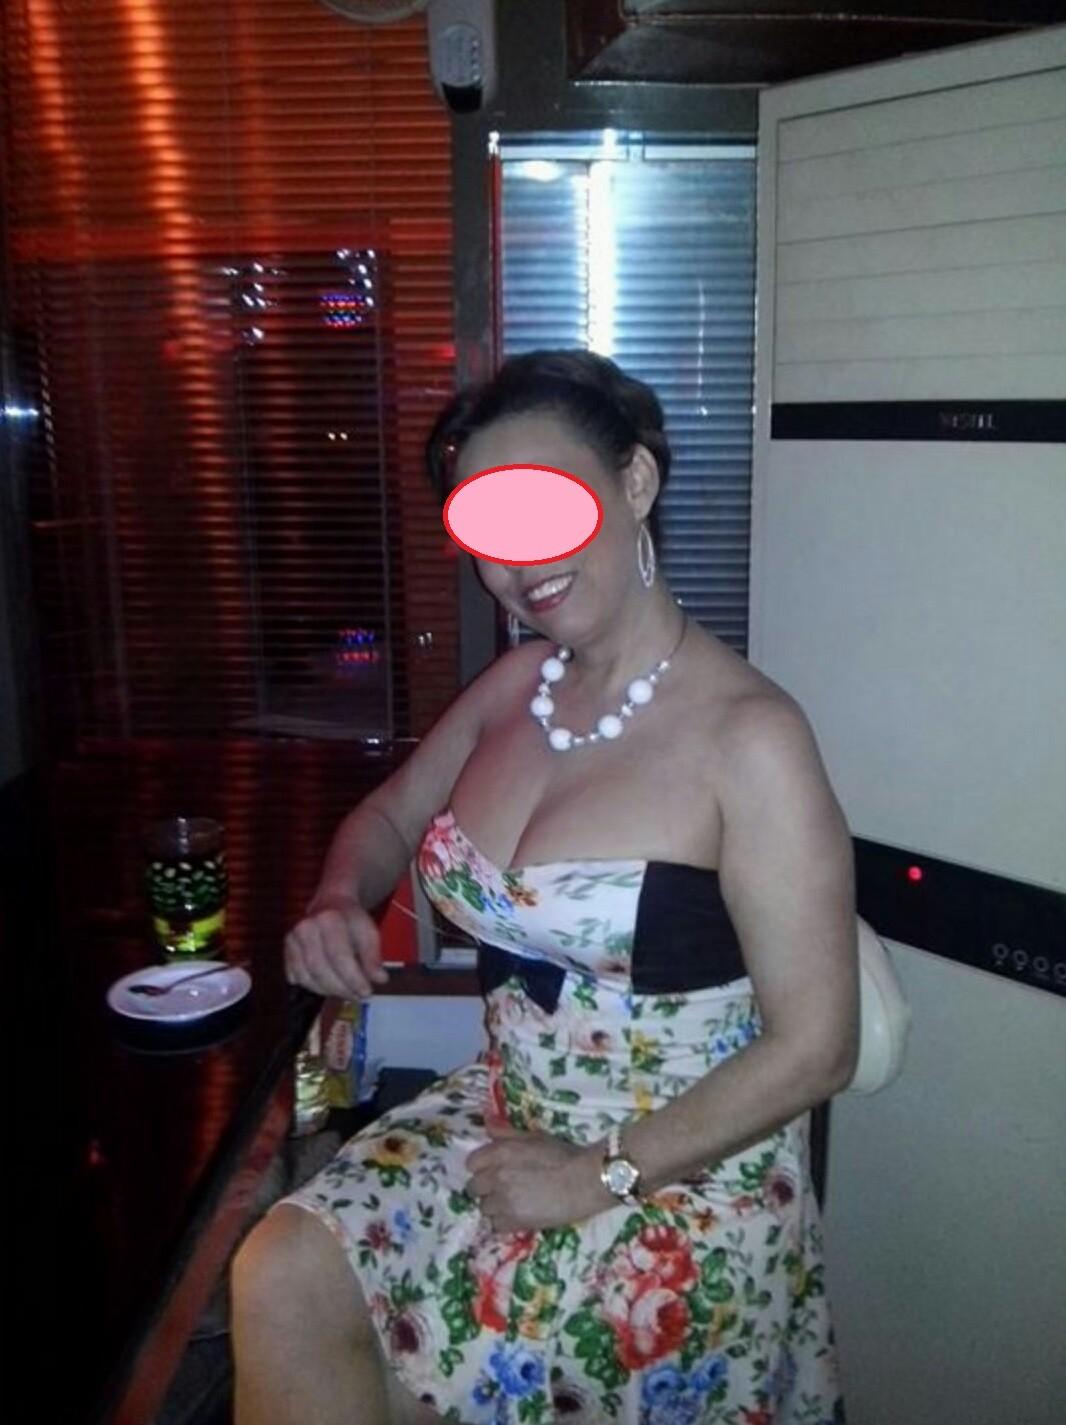 Eroticprince org adult tube